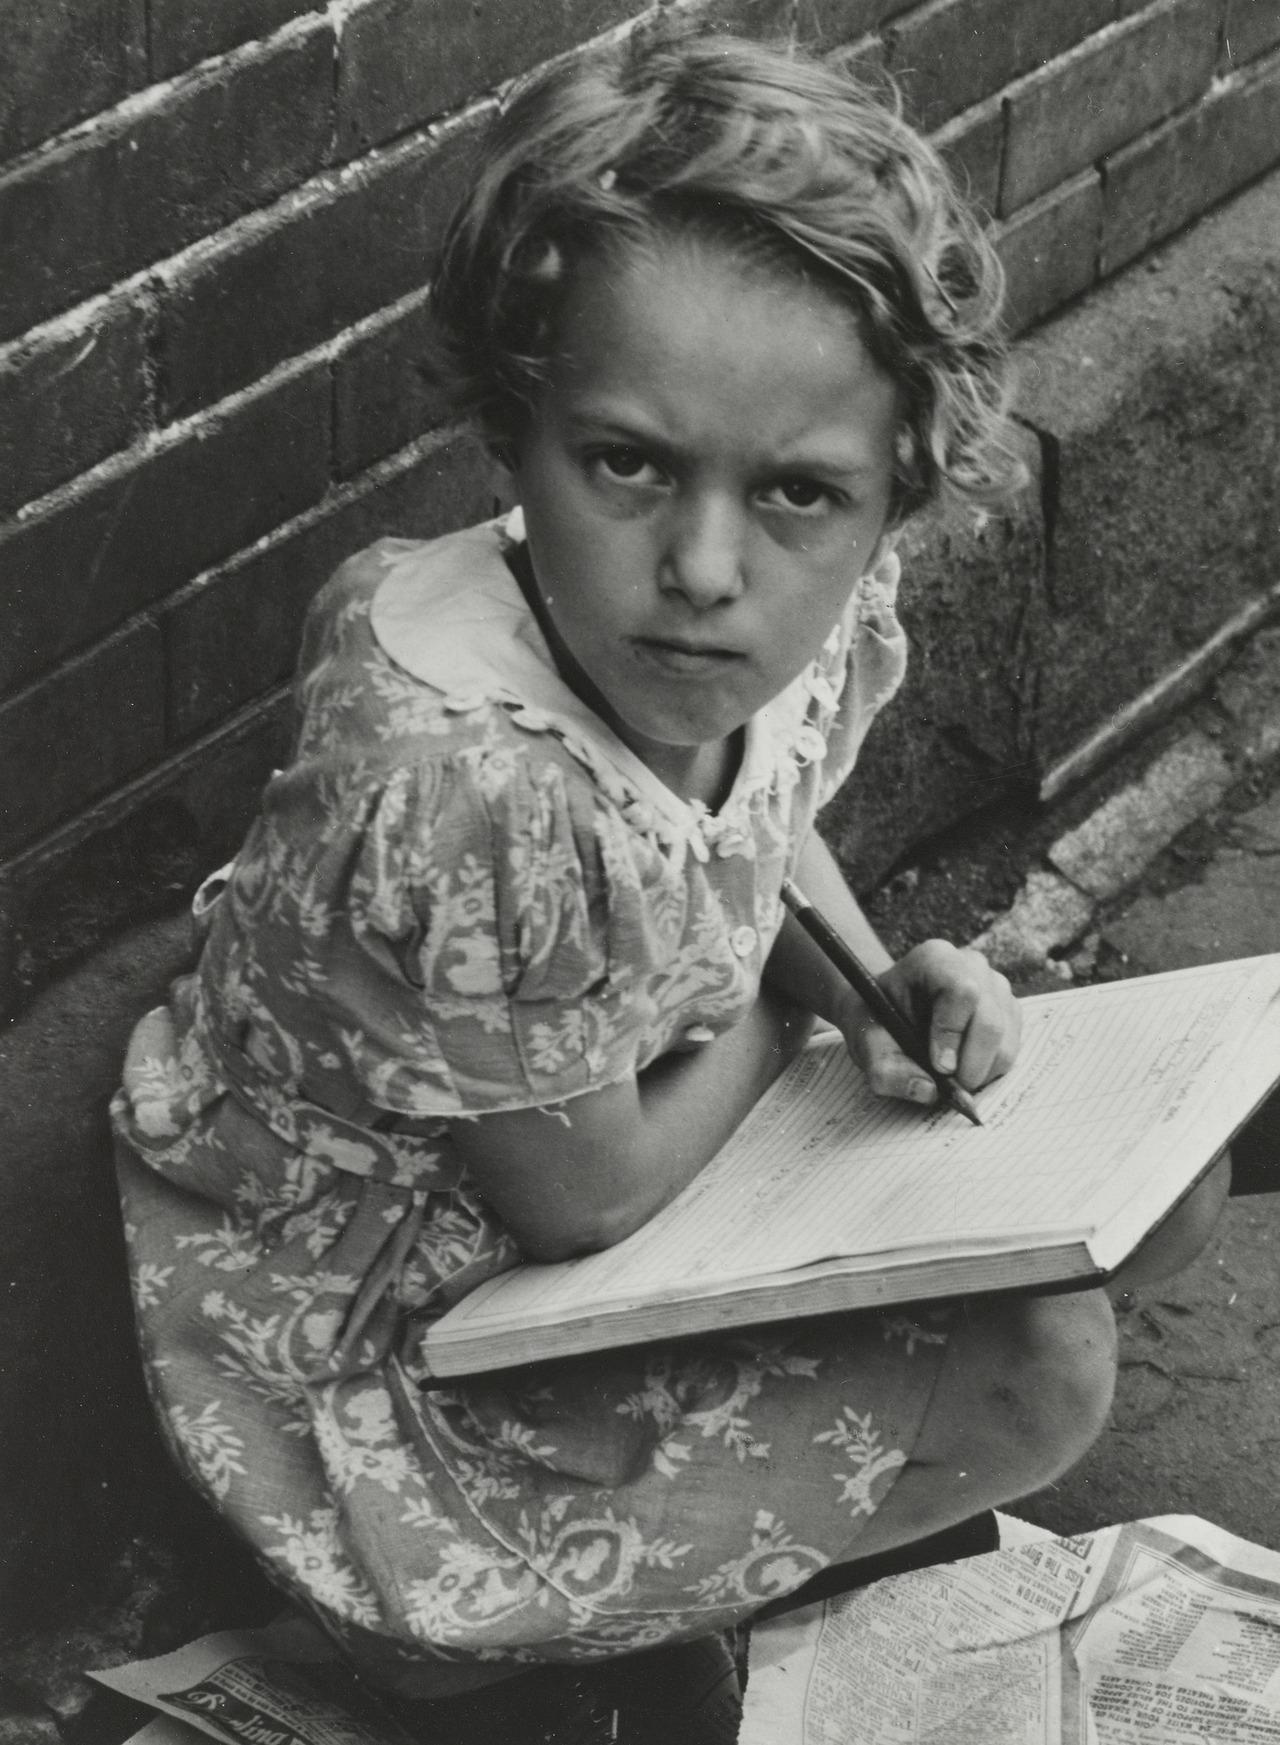 Sid Grossman, Chelsea, New York, 1938.